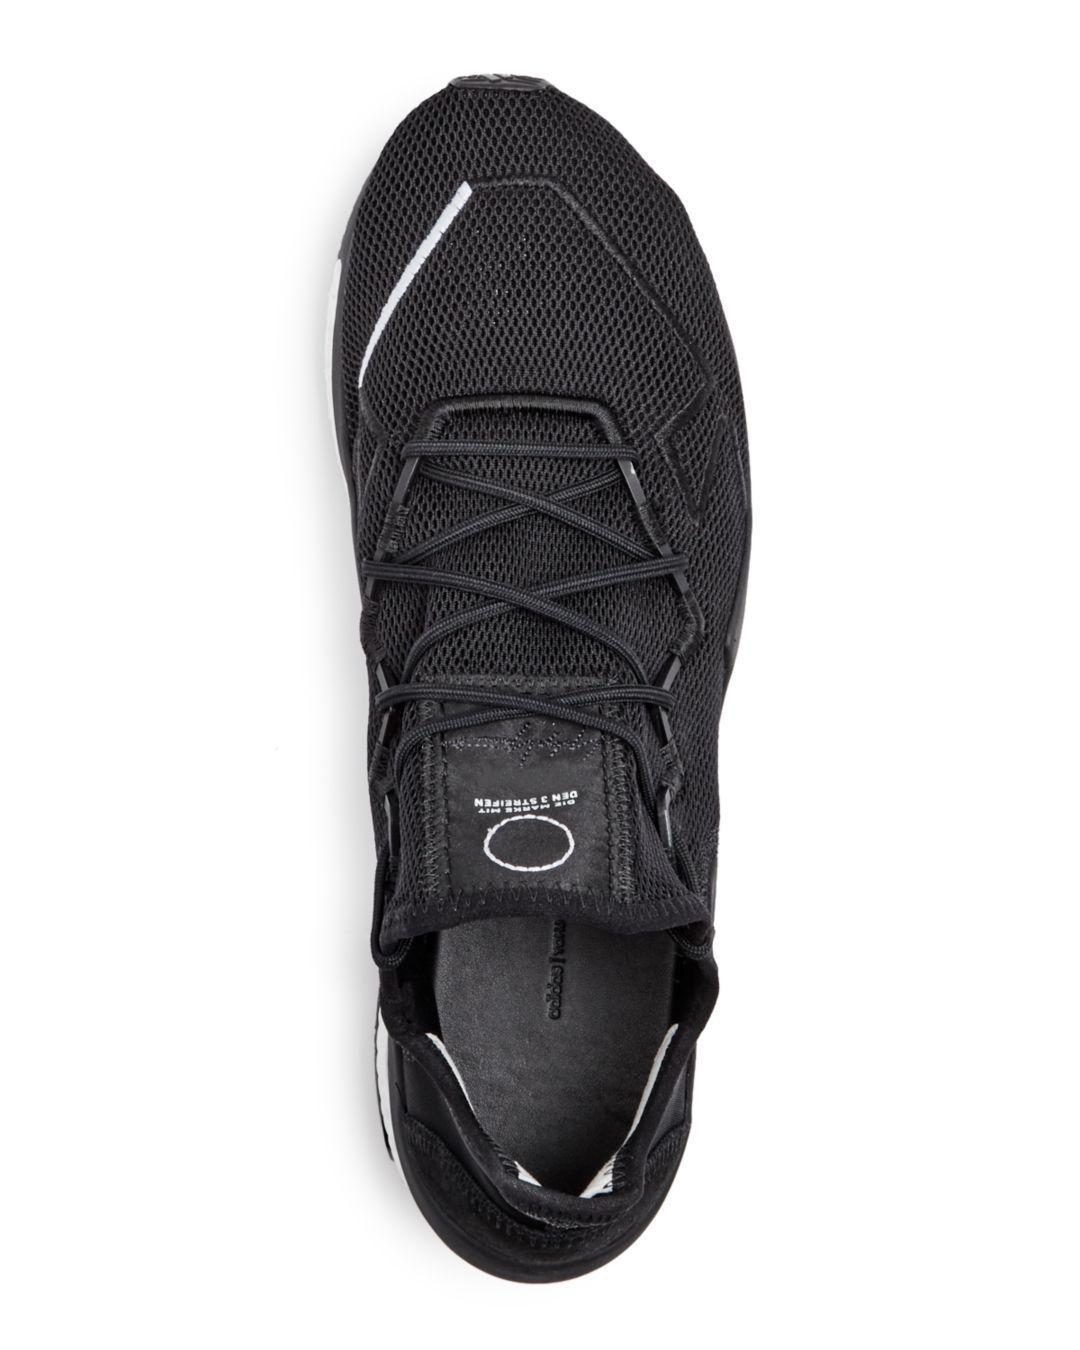 baaaf054b58 Y-3 Men s Adizero Runner Lace Up Sneakers in Black for Men - Lyst